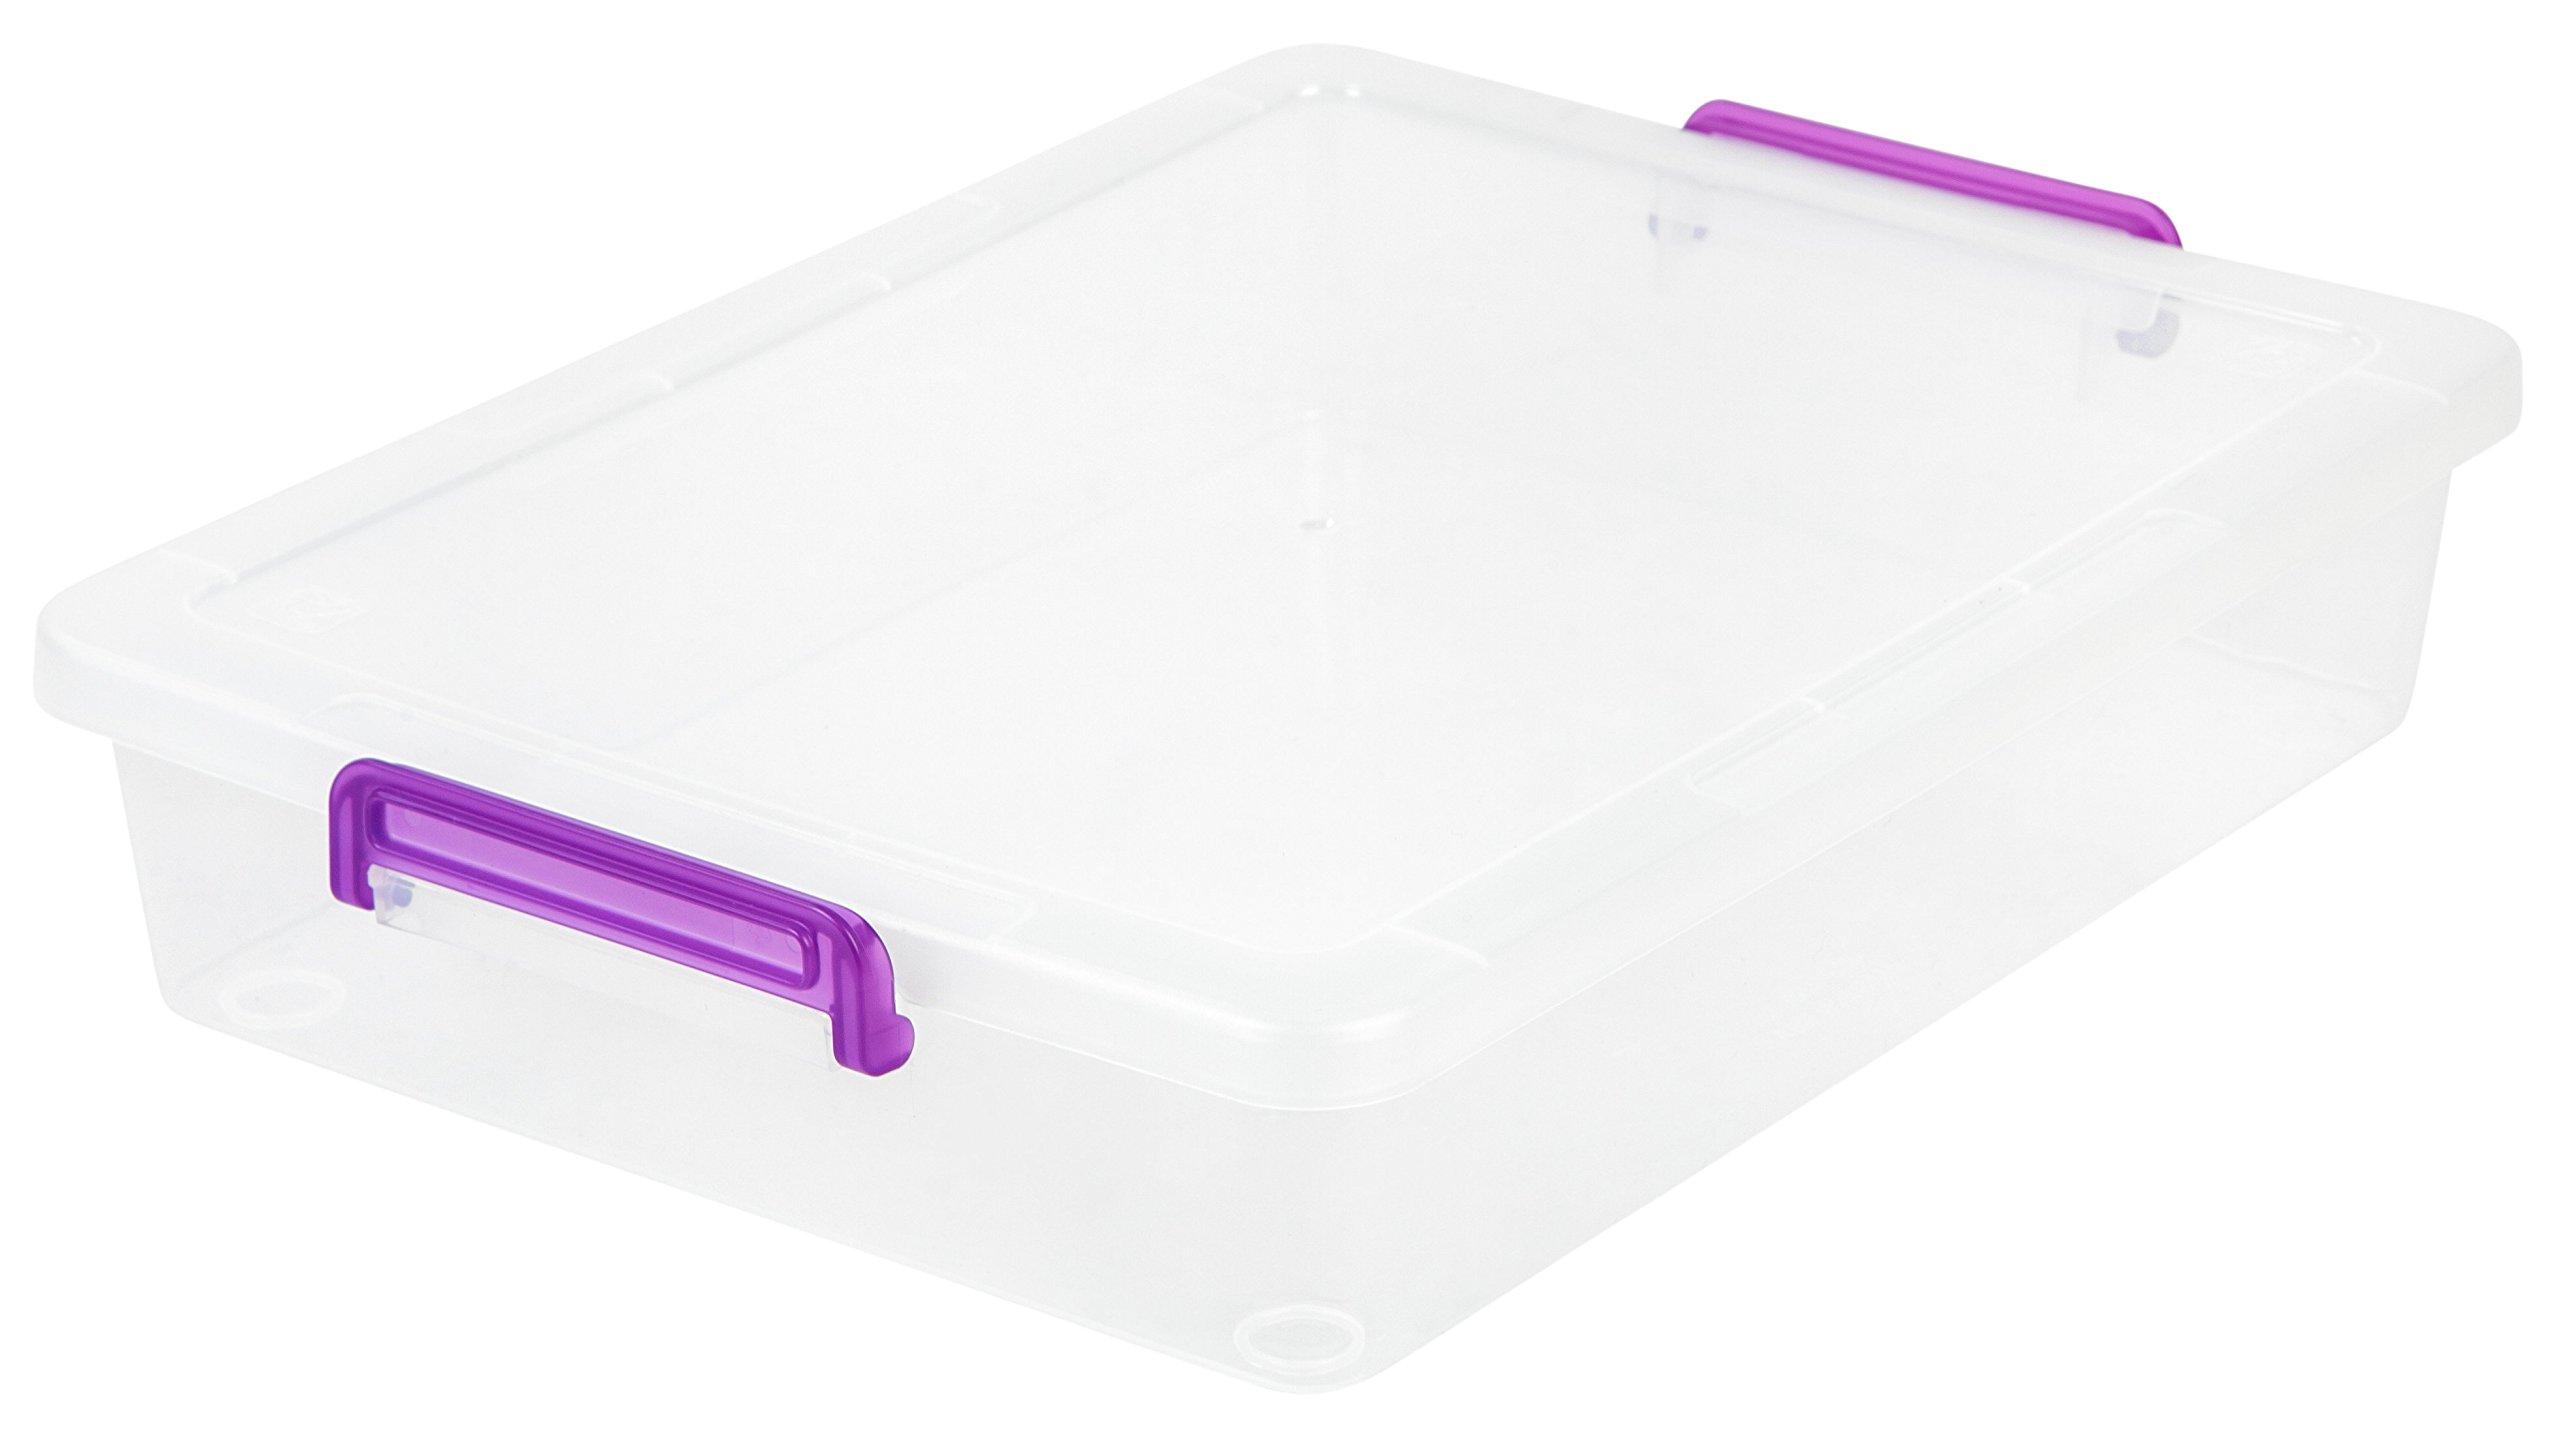 IRIS USA, Inc. MLB-360 Large Modular Latching Box-Purple Handle, 6 Pack, Clear, Violet by IRIS USA, Inc.